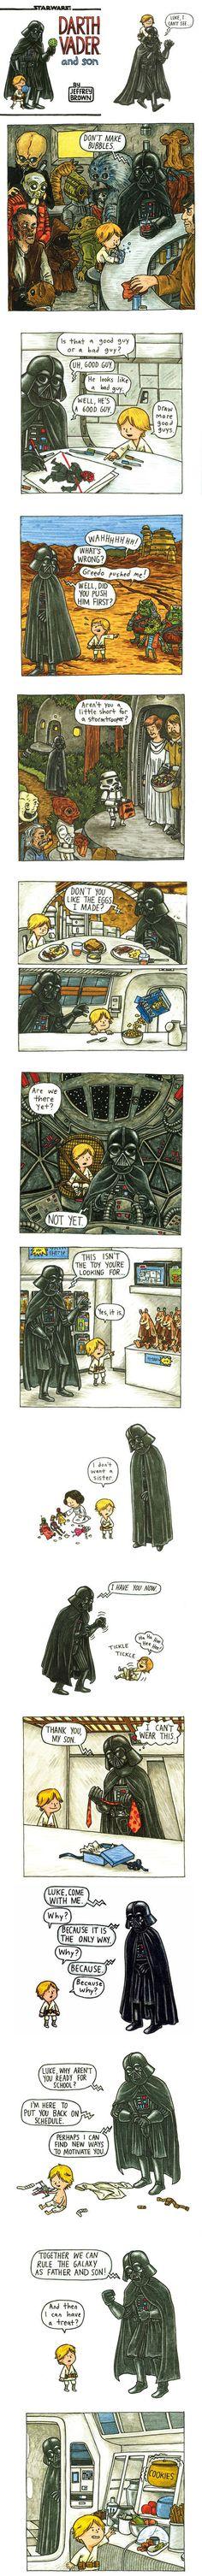 Darth Vader father & son.